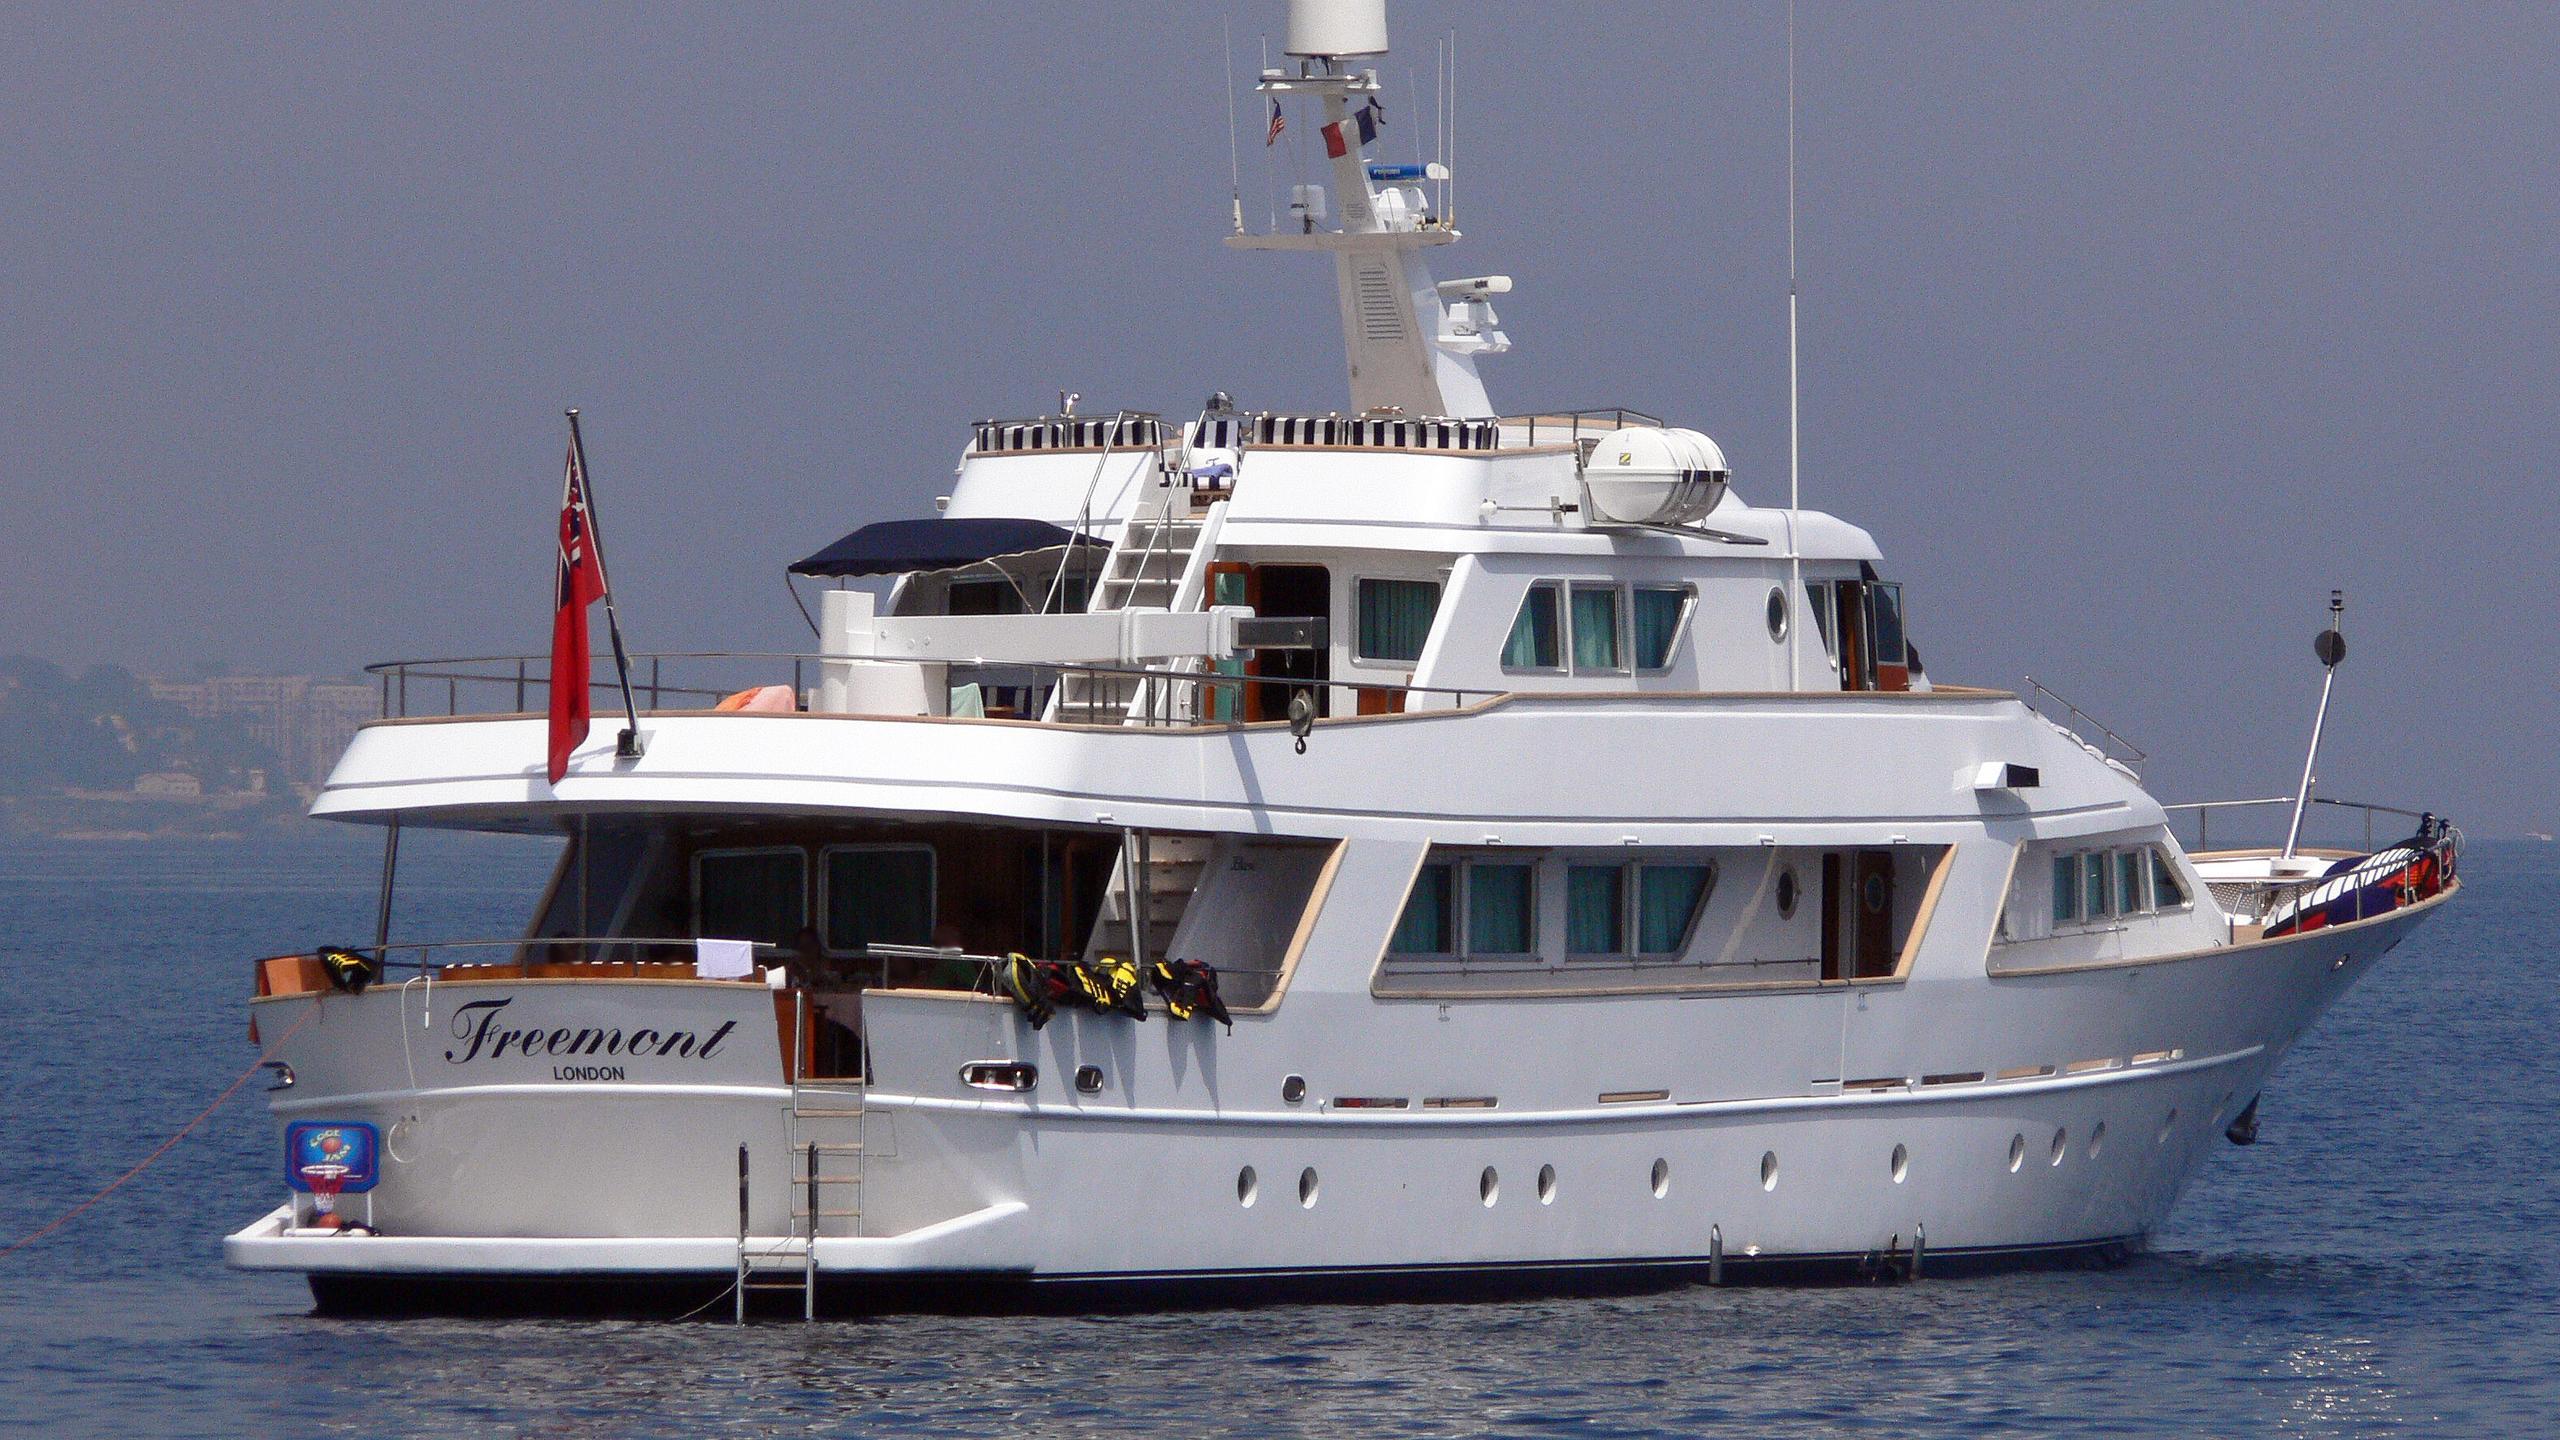 freemont-motor-yacht-benetti-1983-34m-stern